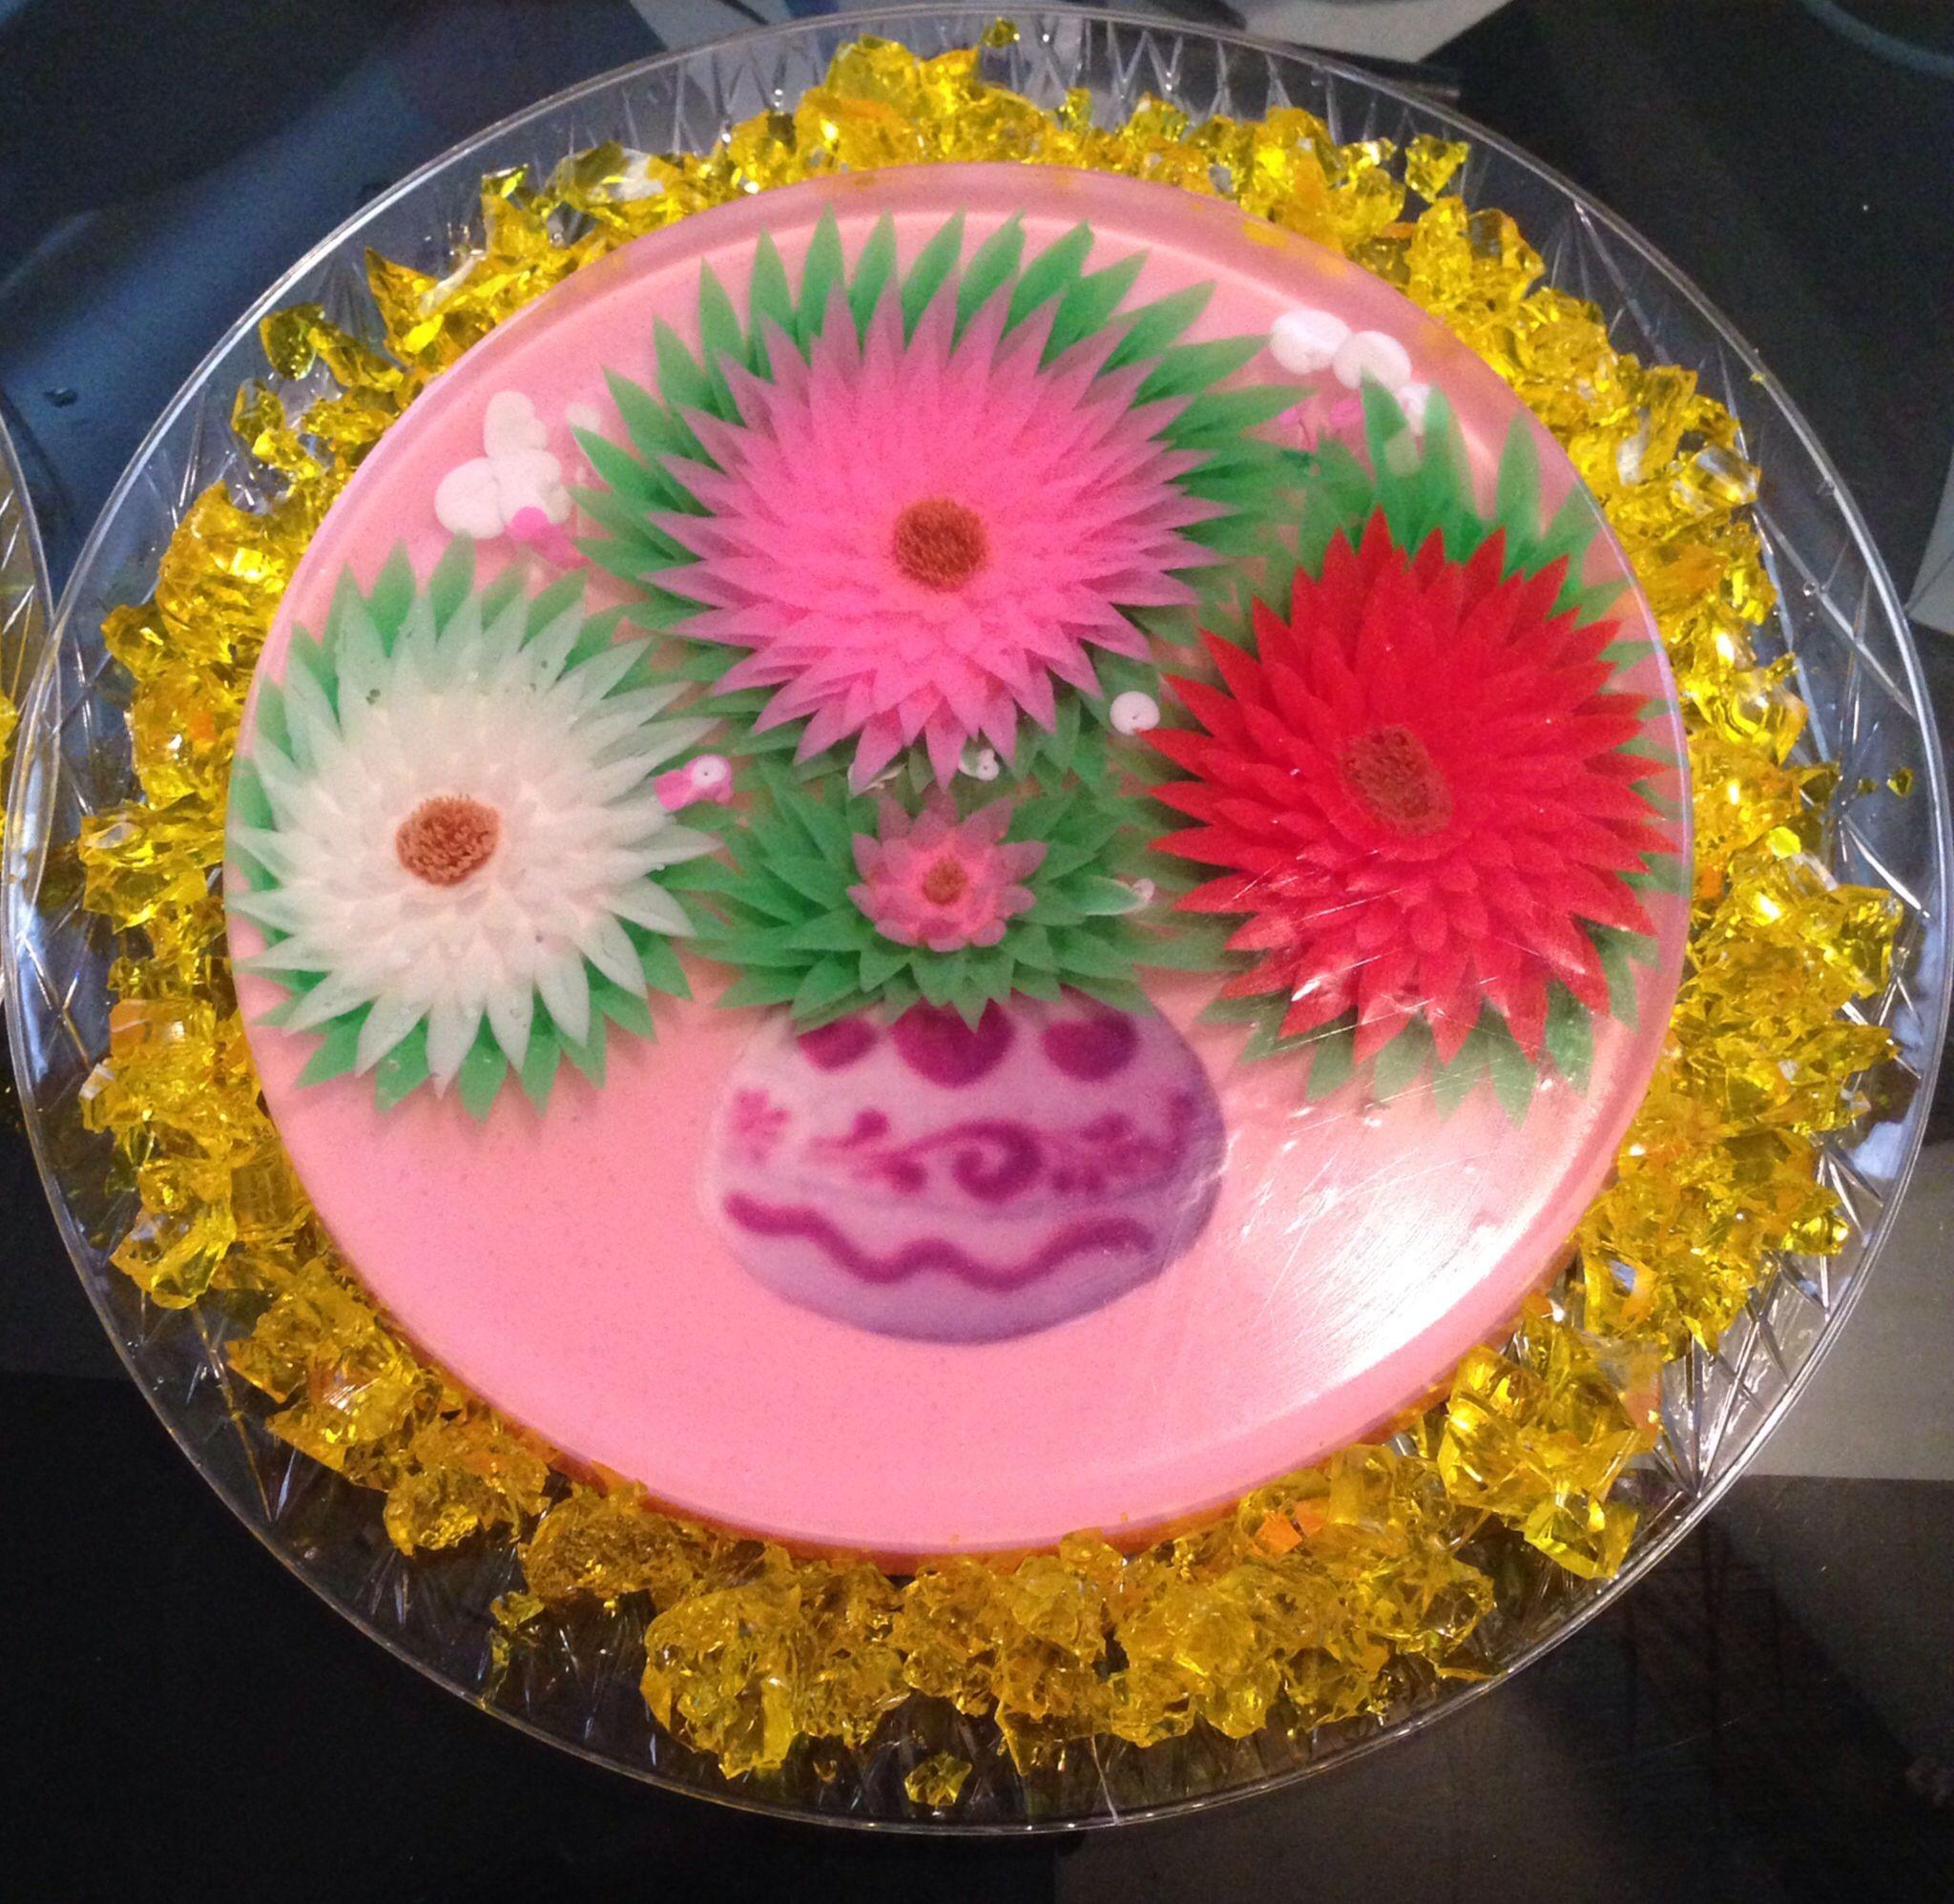 3D gelatin